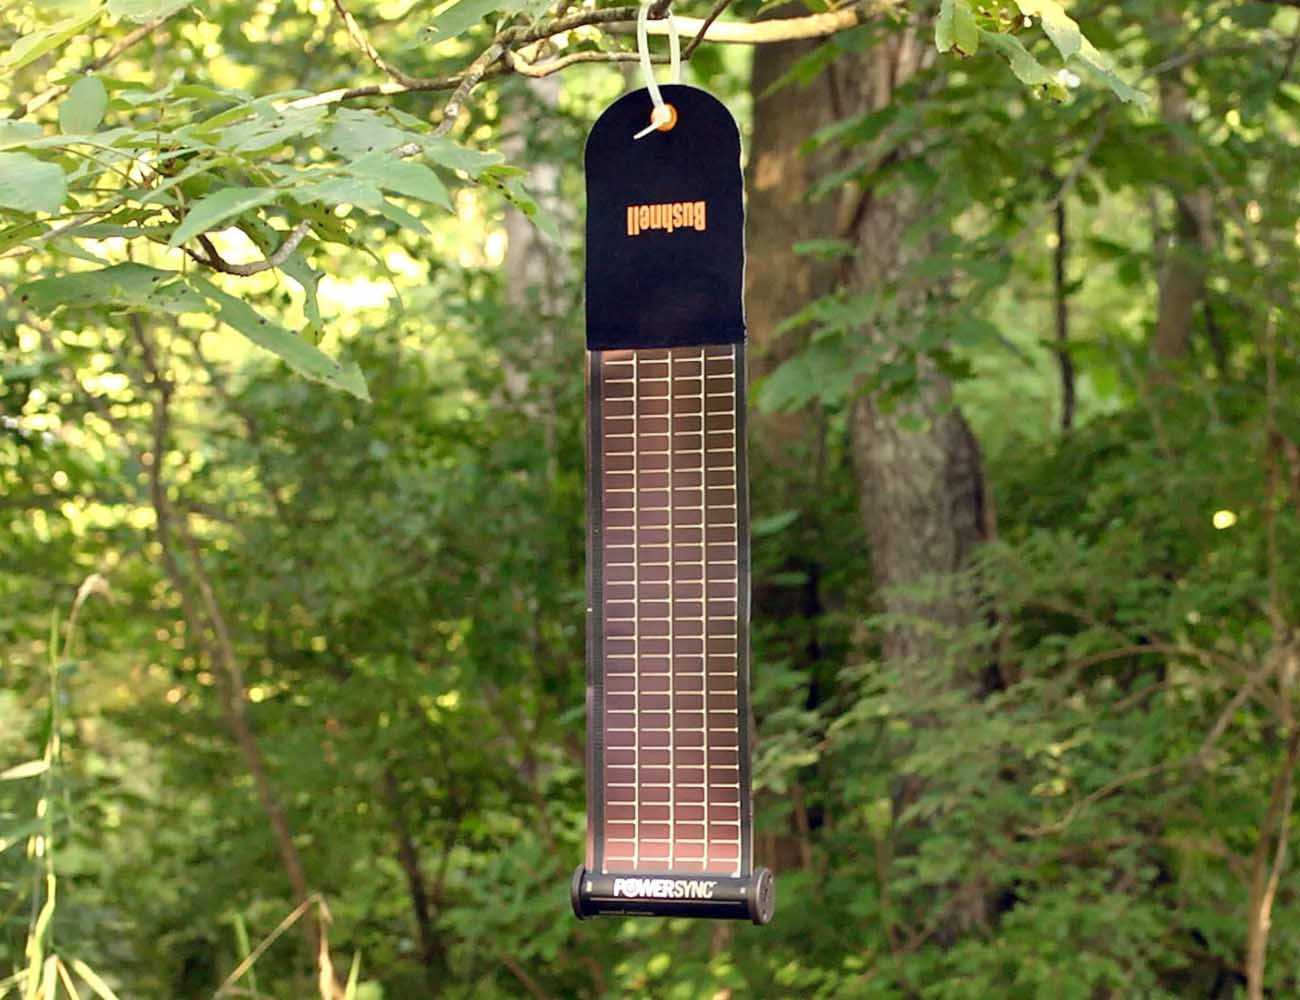 Bushnell Solarwrap Solar Power Charger 187 Gadget Flow